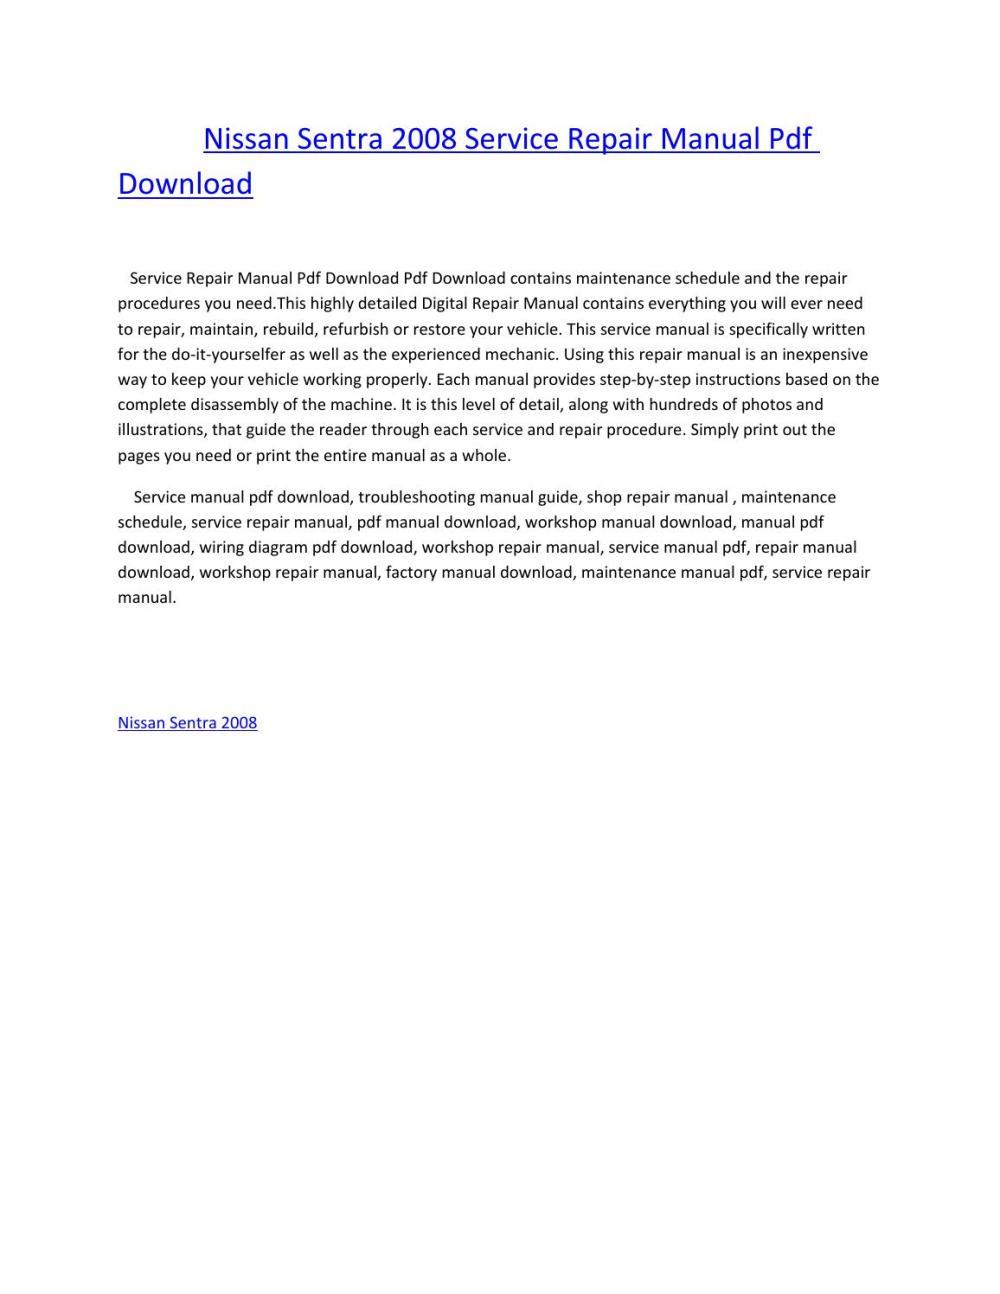 medium resolution of nissan sentra 2008 service repair manual pdf download by amurgului issuu